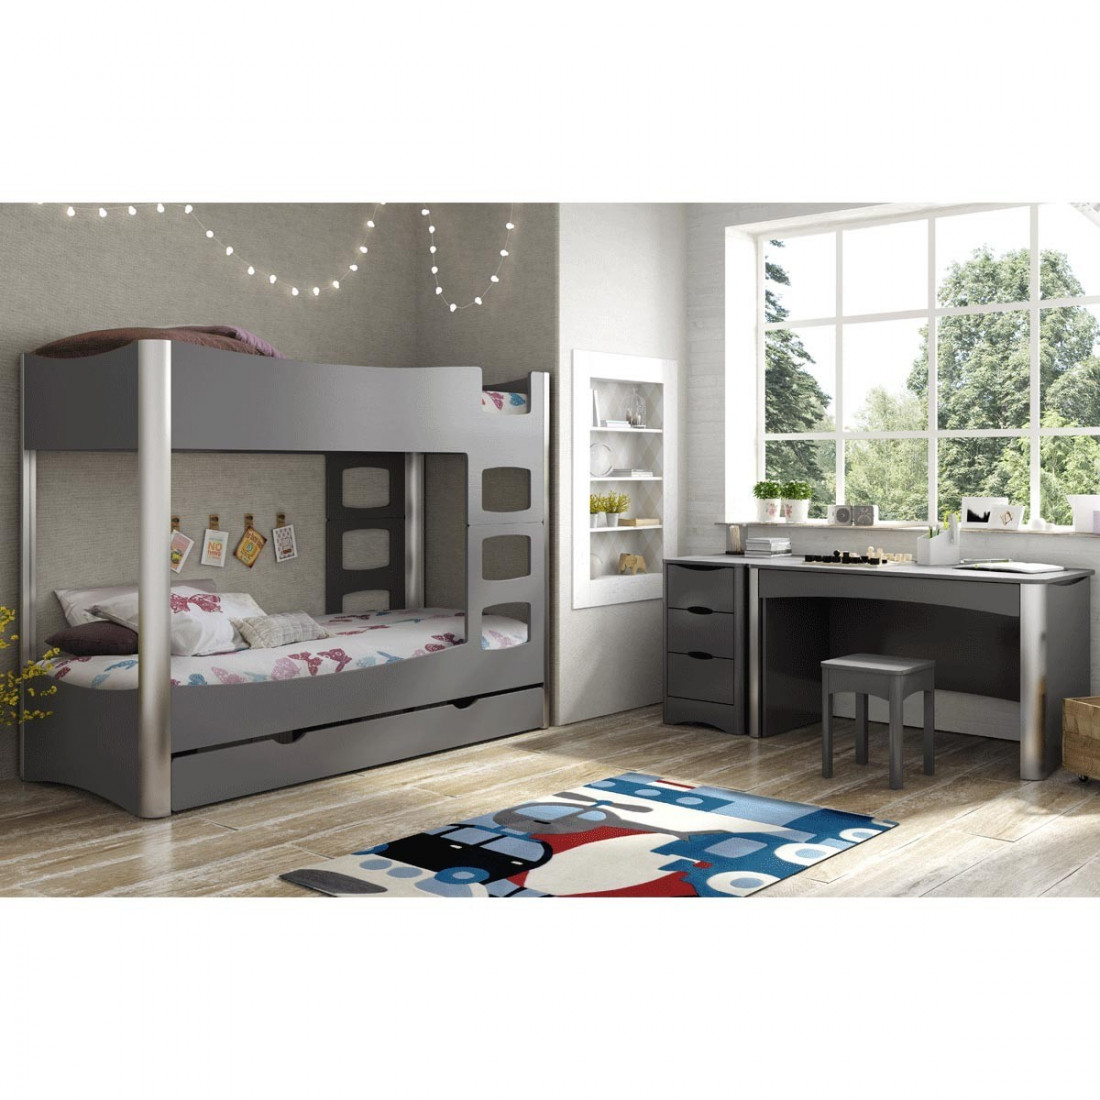 bureau enfant 1 tiroir fusion mathy by bols ma chambramoi. Black Bedroom Furniture Sets. Home Design Ideas